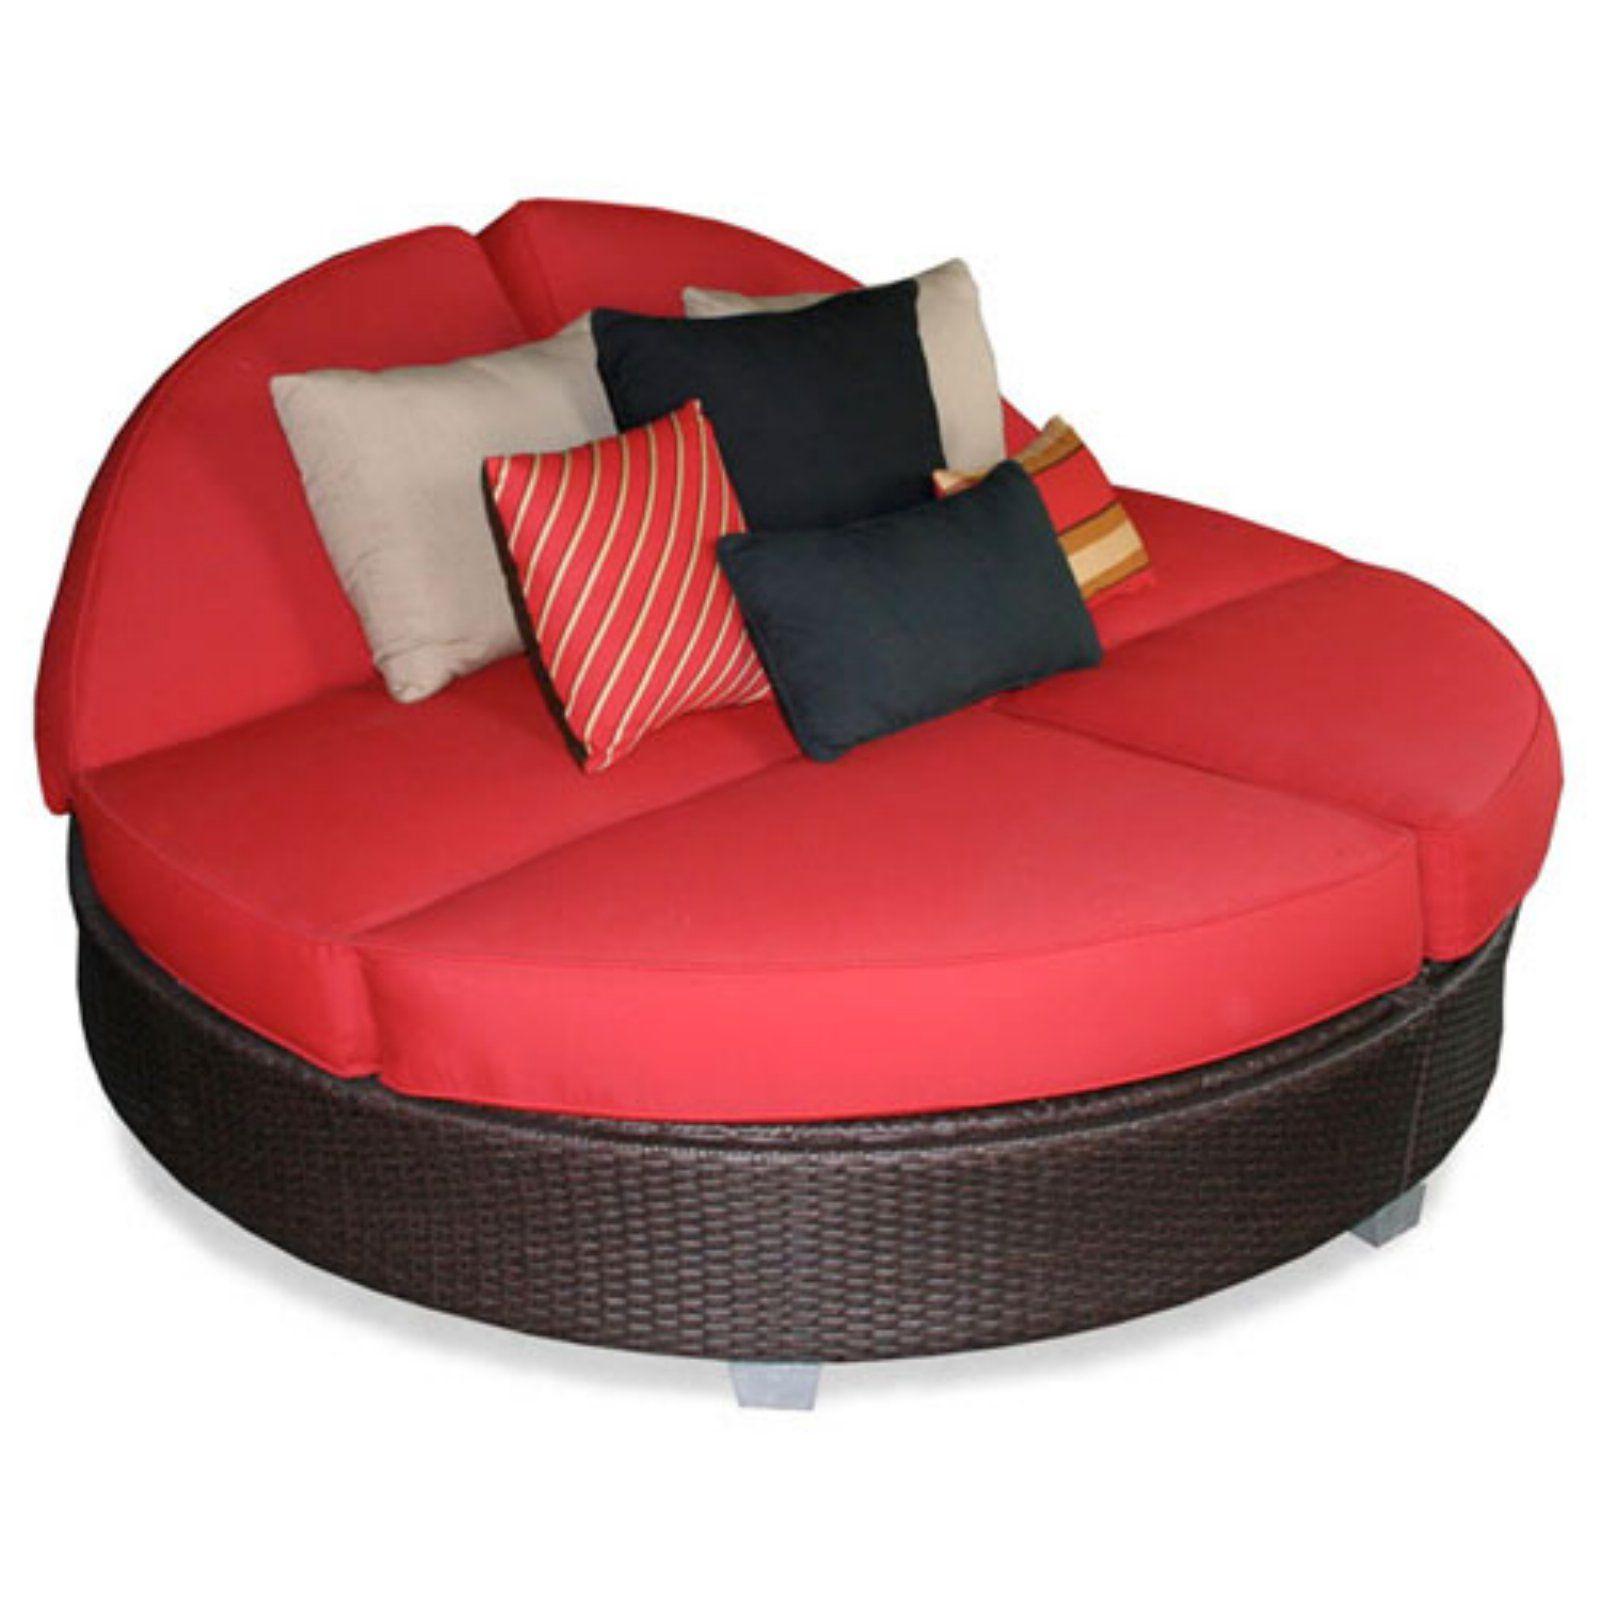 Superb Outdoor Patio Heaven Signature Round Double Chaise Sunbrella Beatyapartments Chair Design Images Beatyapartmentscom